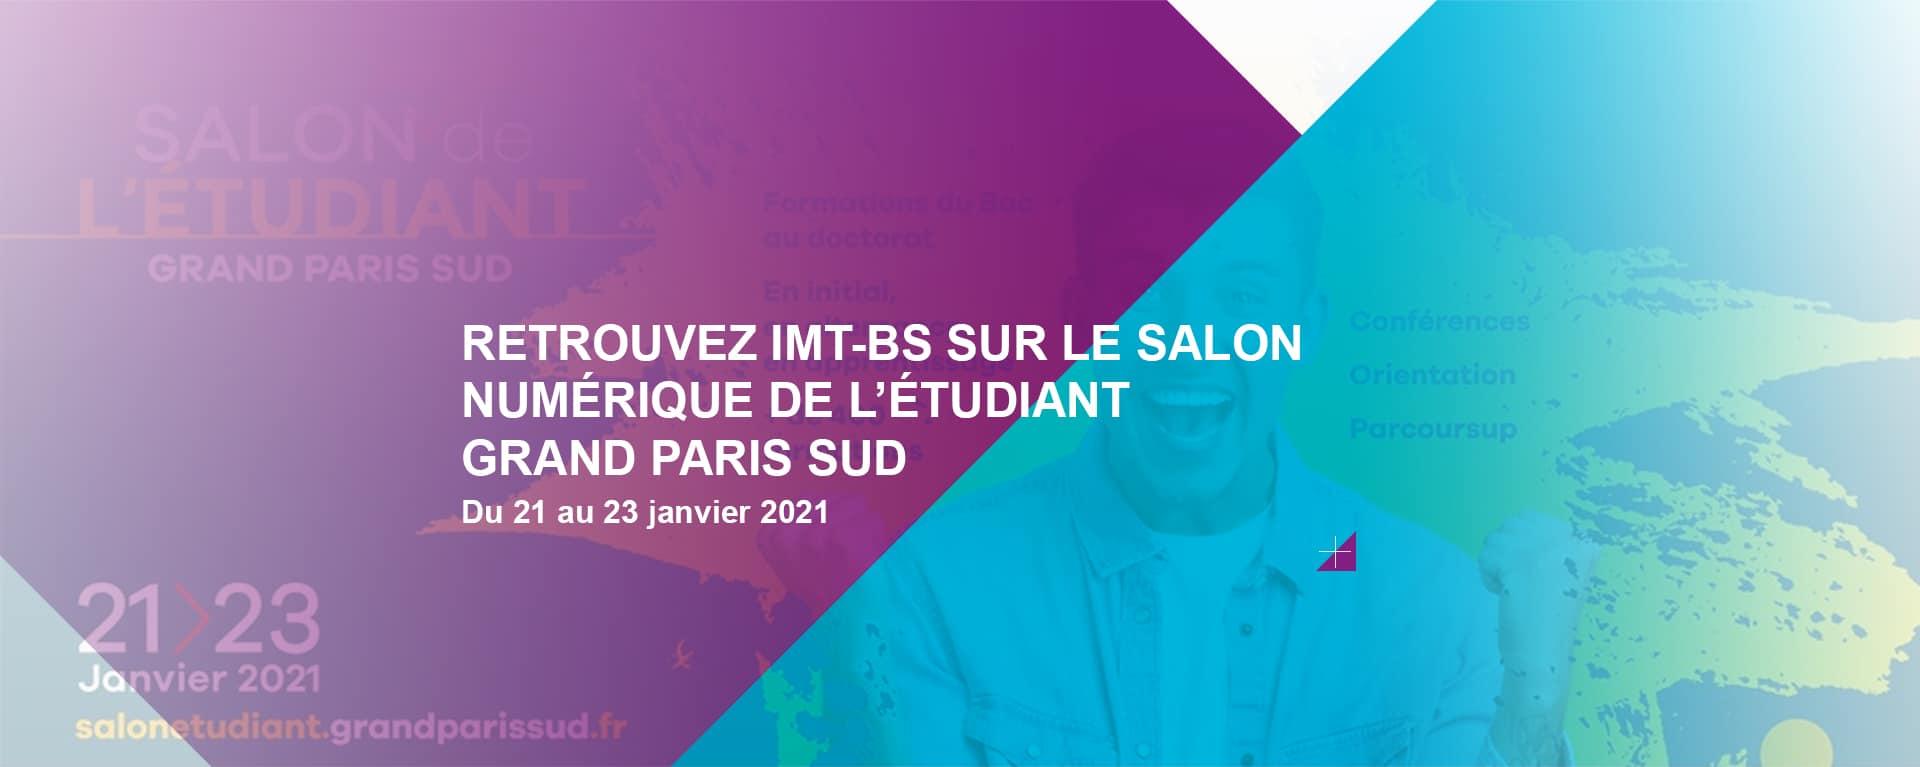 Salon de l'Etudiant Grand Paris Sud